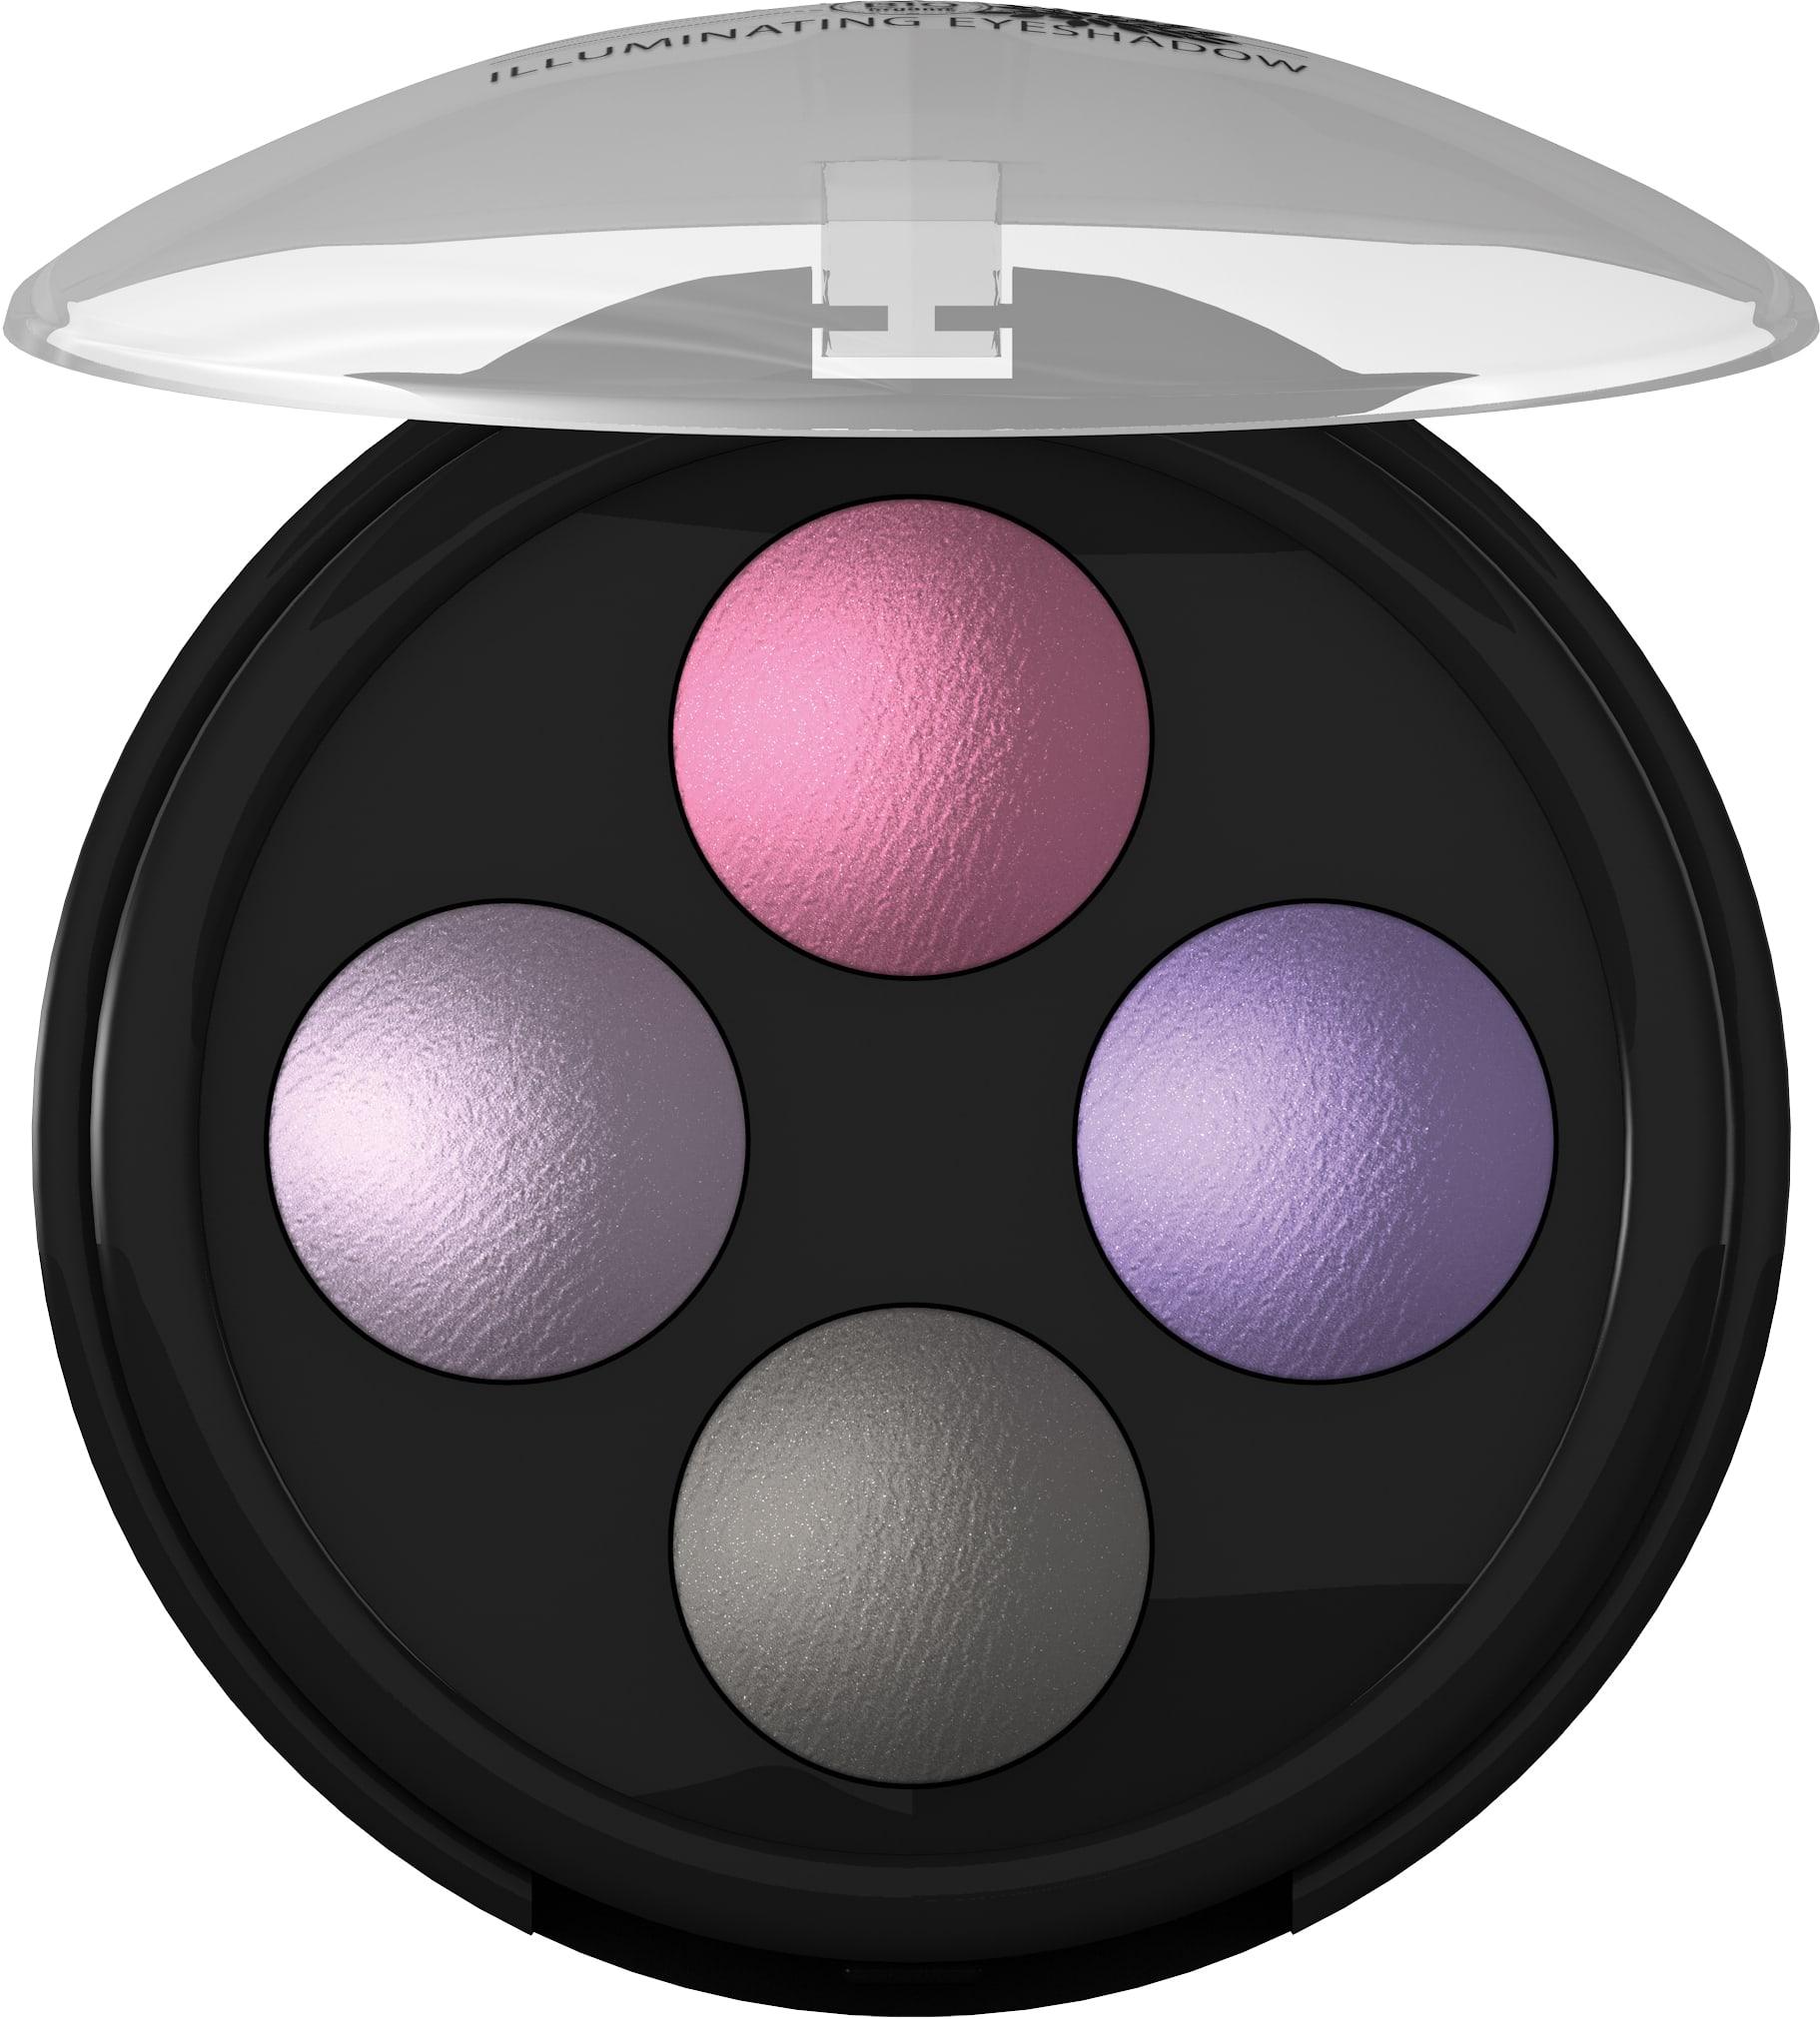 Illuminating Eyeshadow Quattro -Lavender Couture 02-